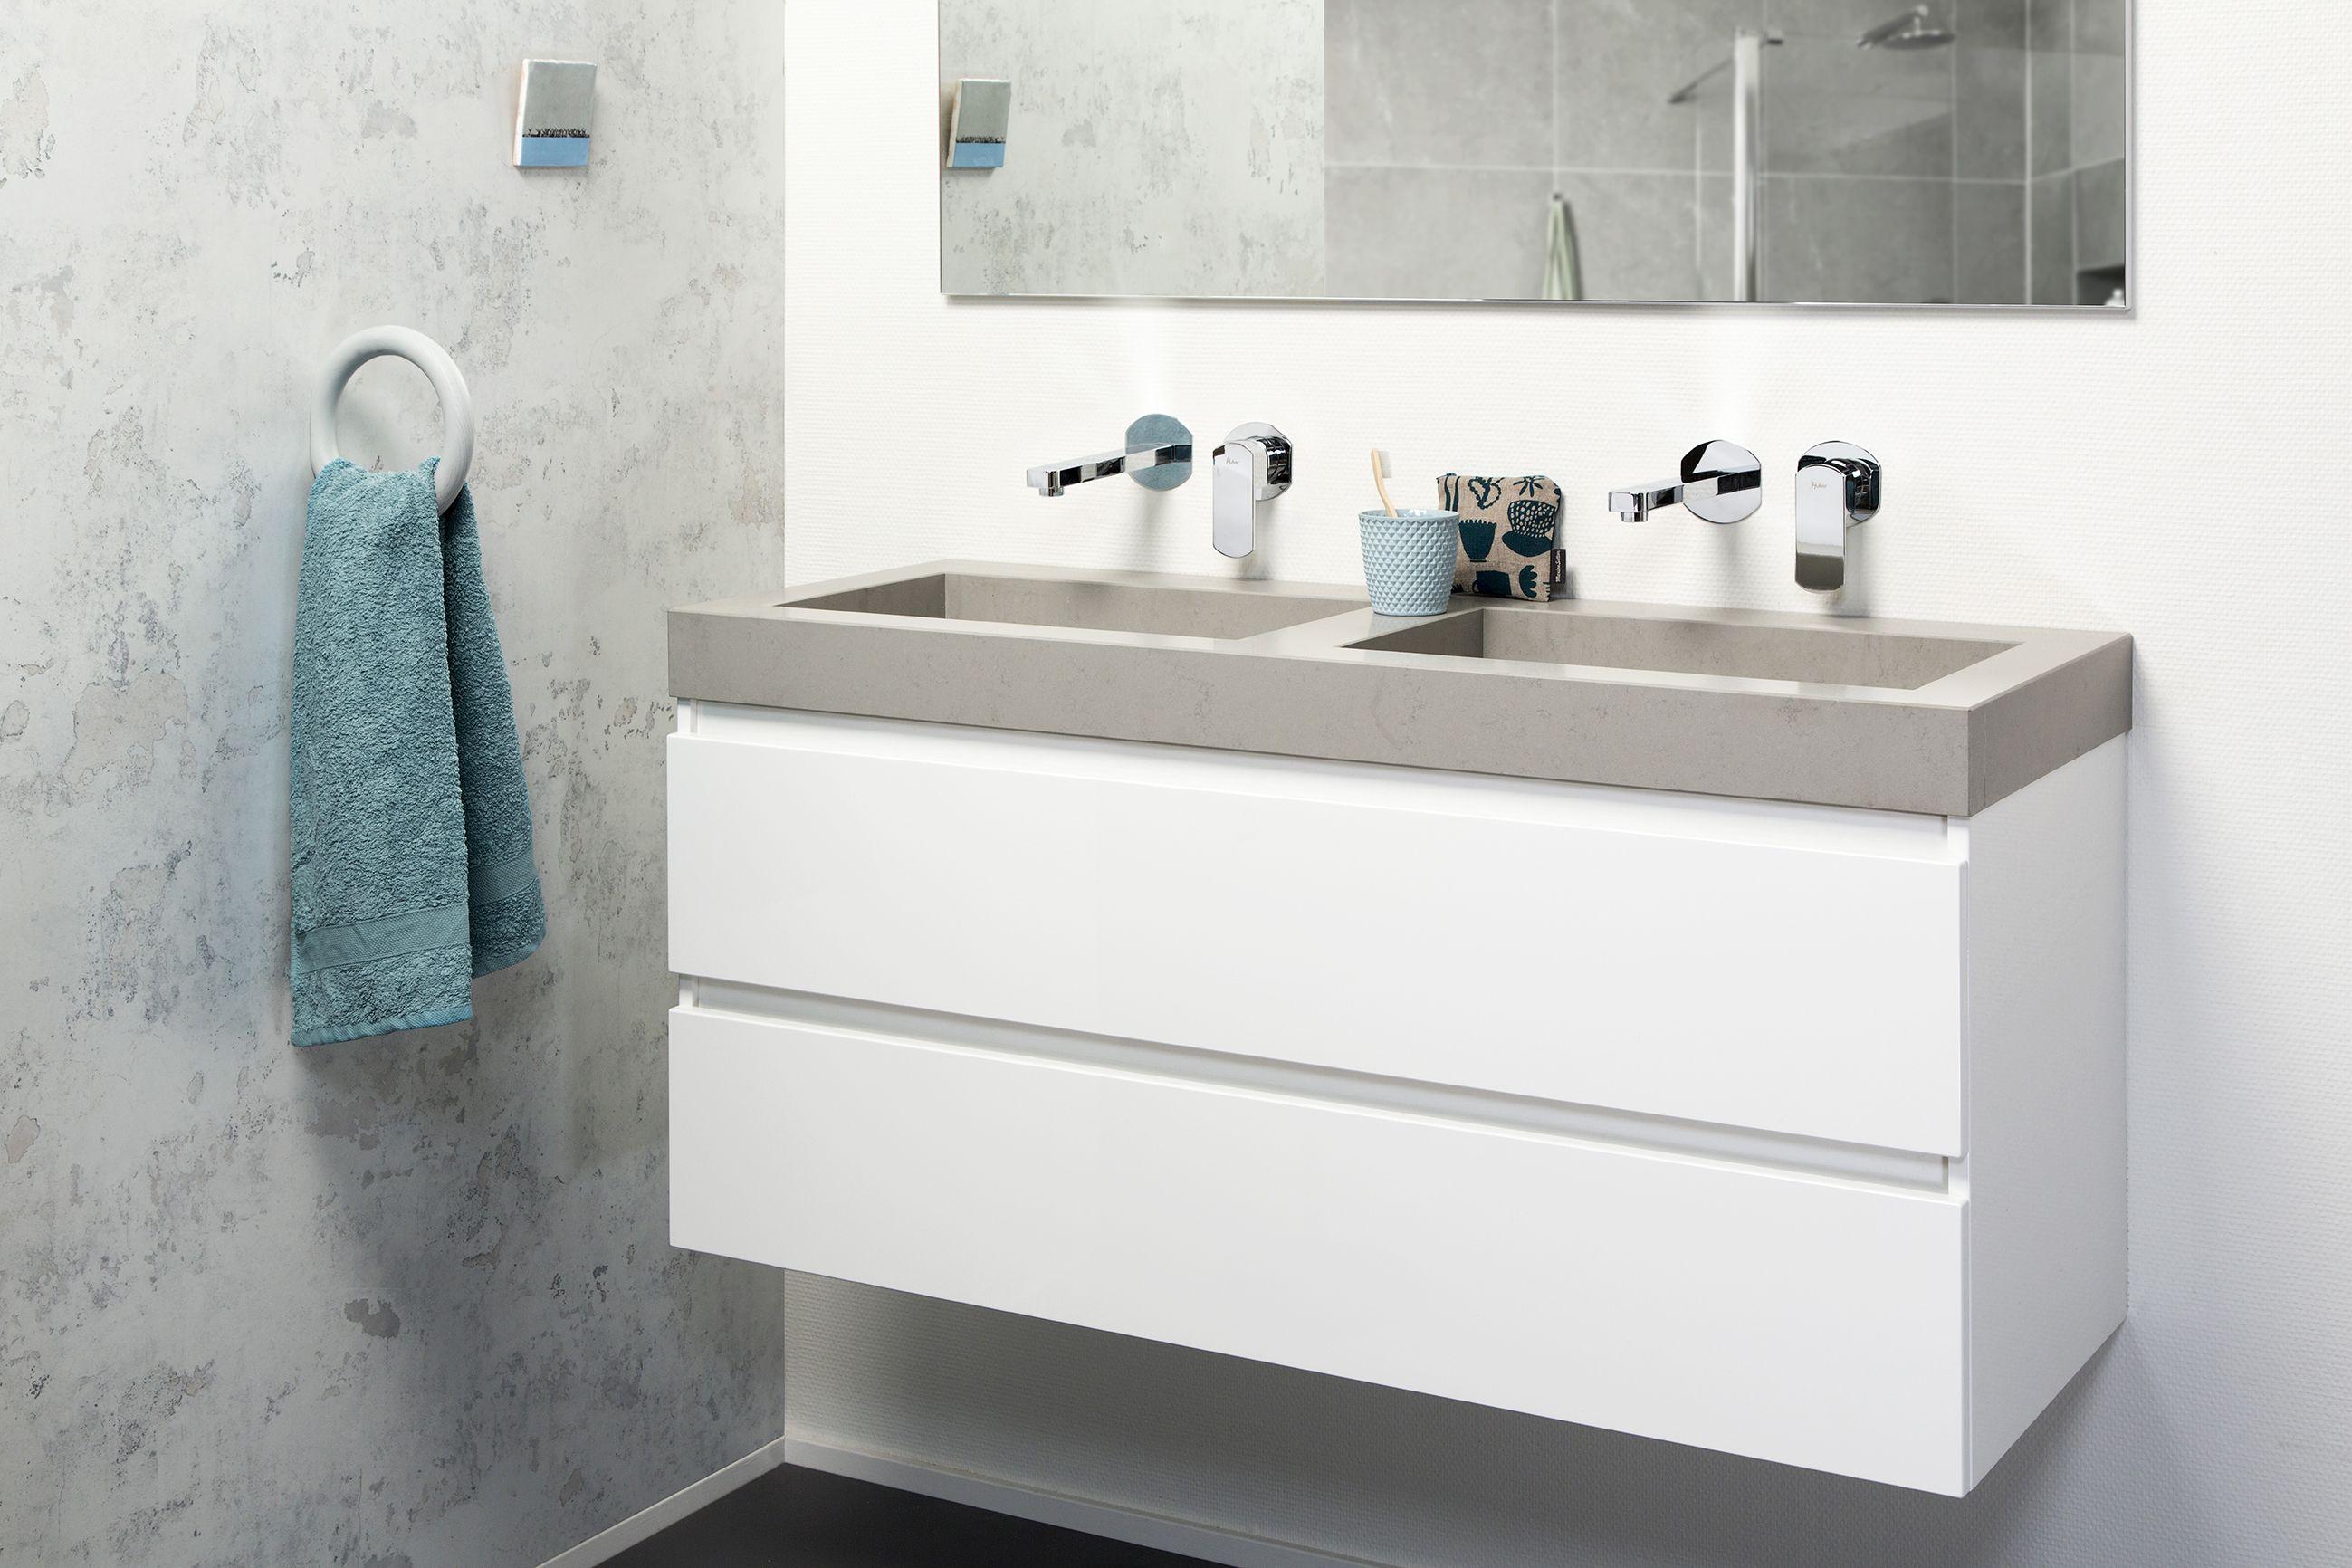 Badkamermeubel lavanto allasio in hoogglans wit met inclinata